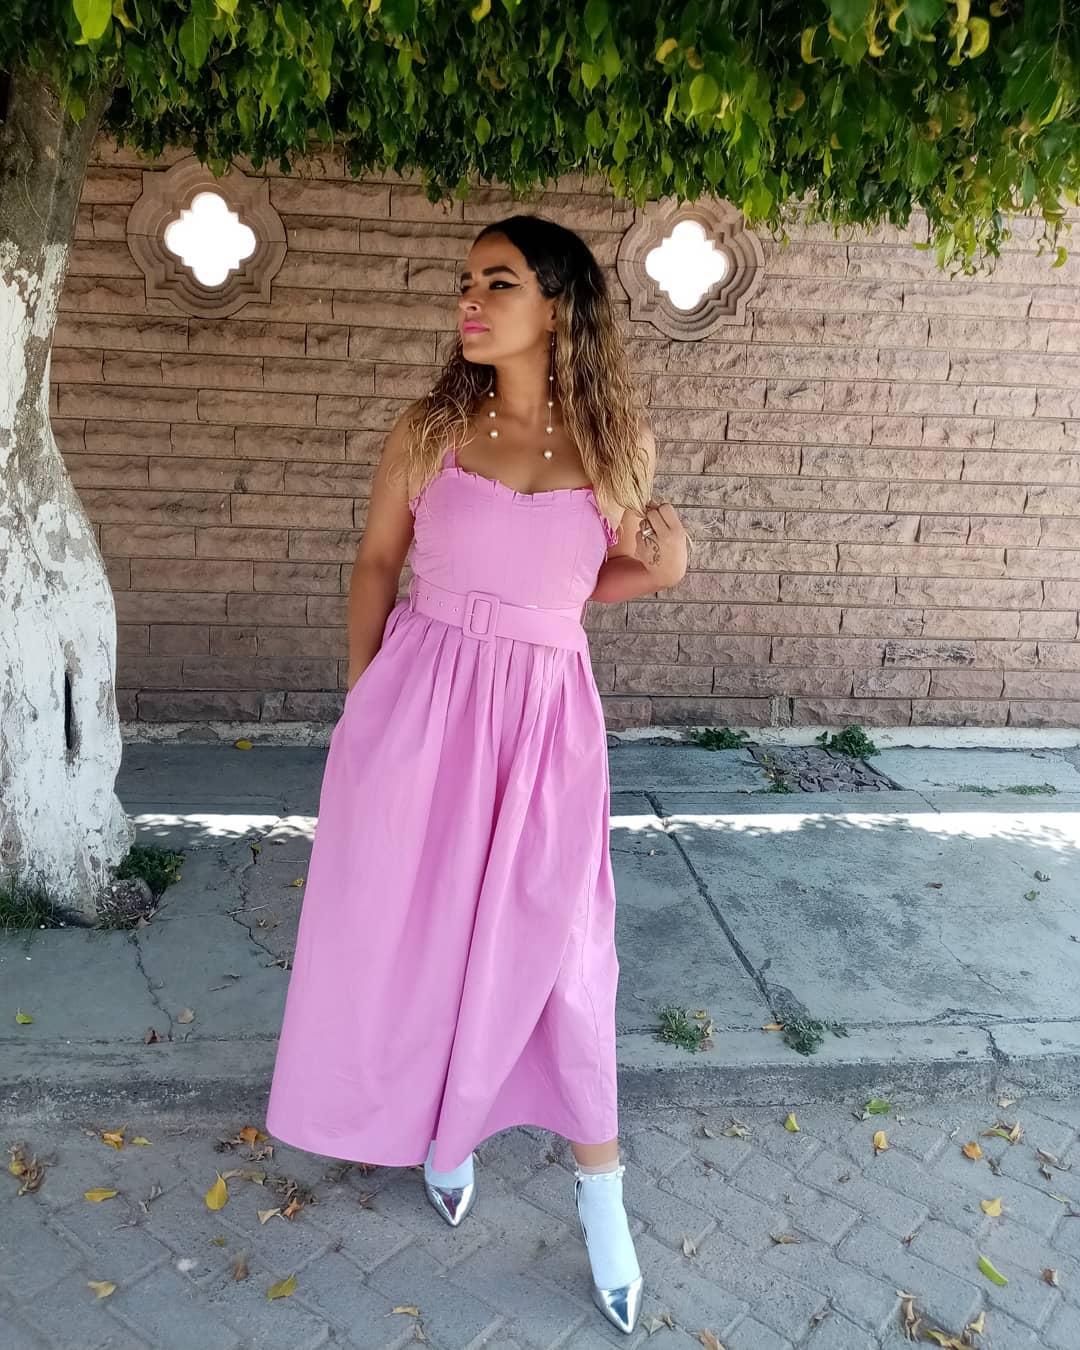 poplin dress with belt de Zara sur mina1689hm